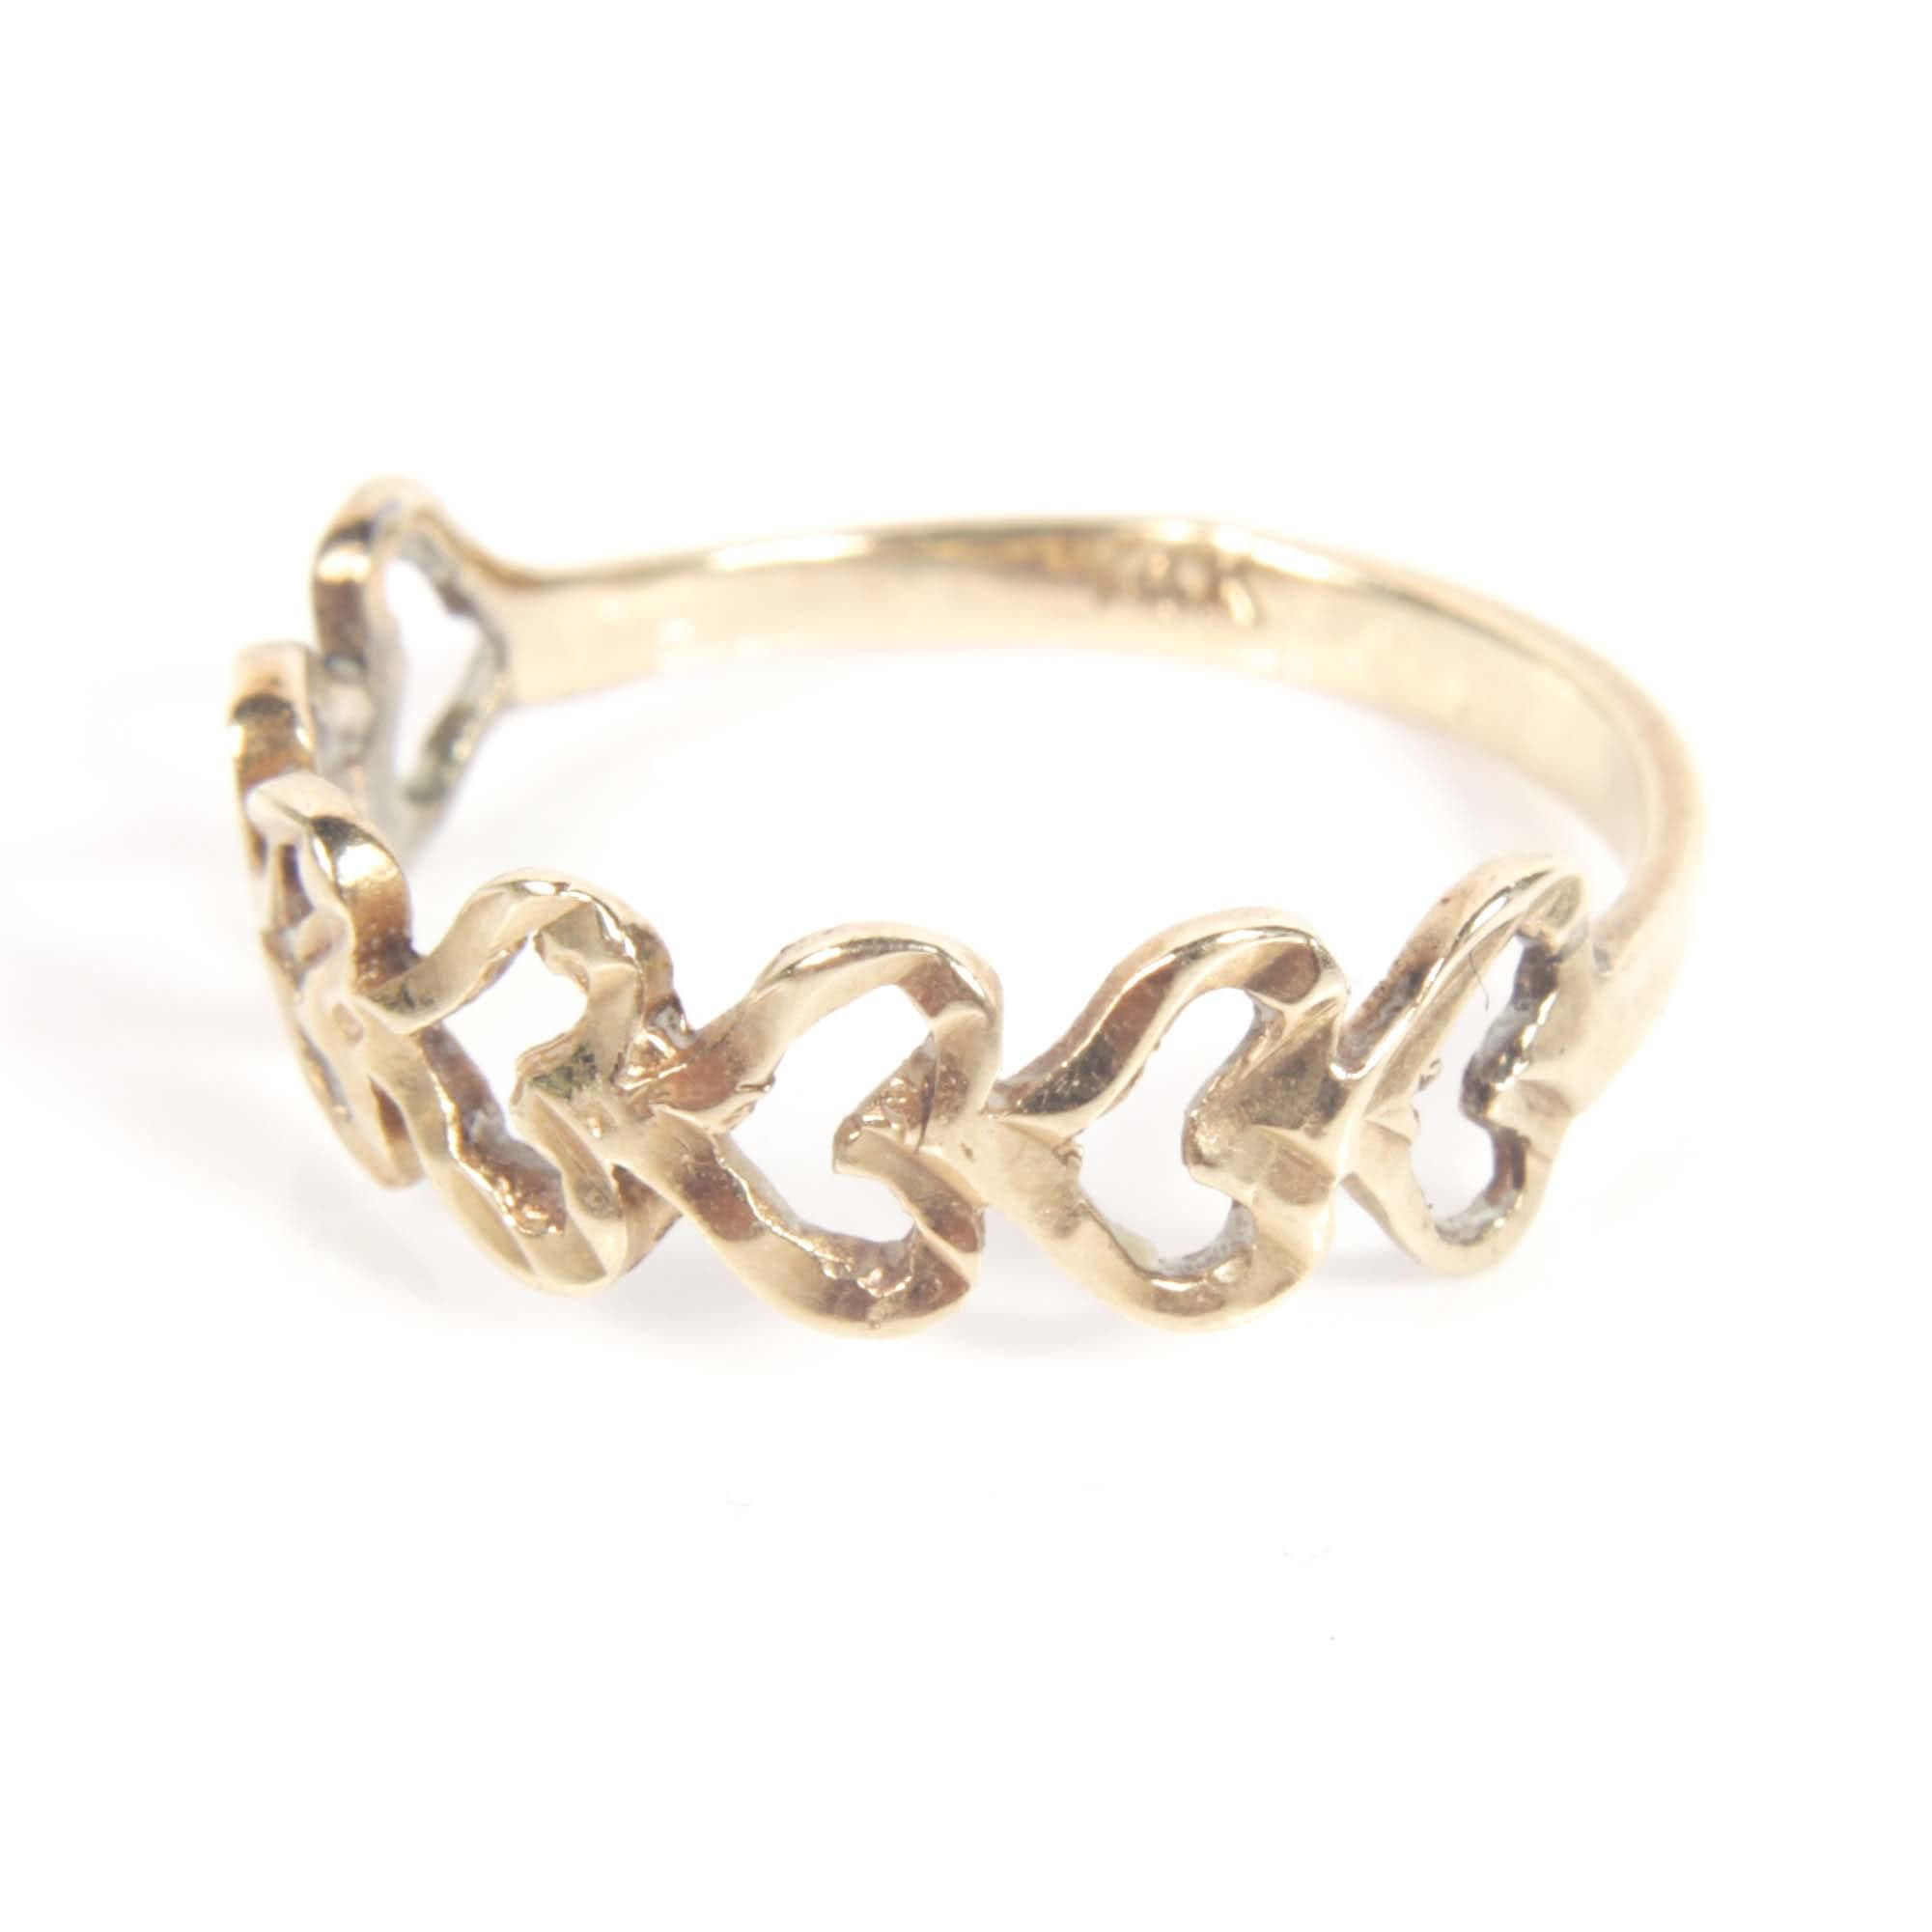 14K Yellow Gold Open Heart Ring